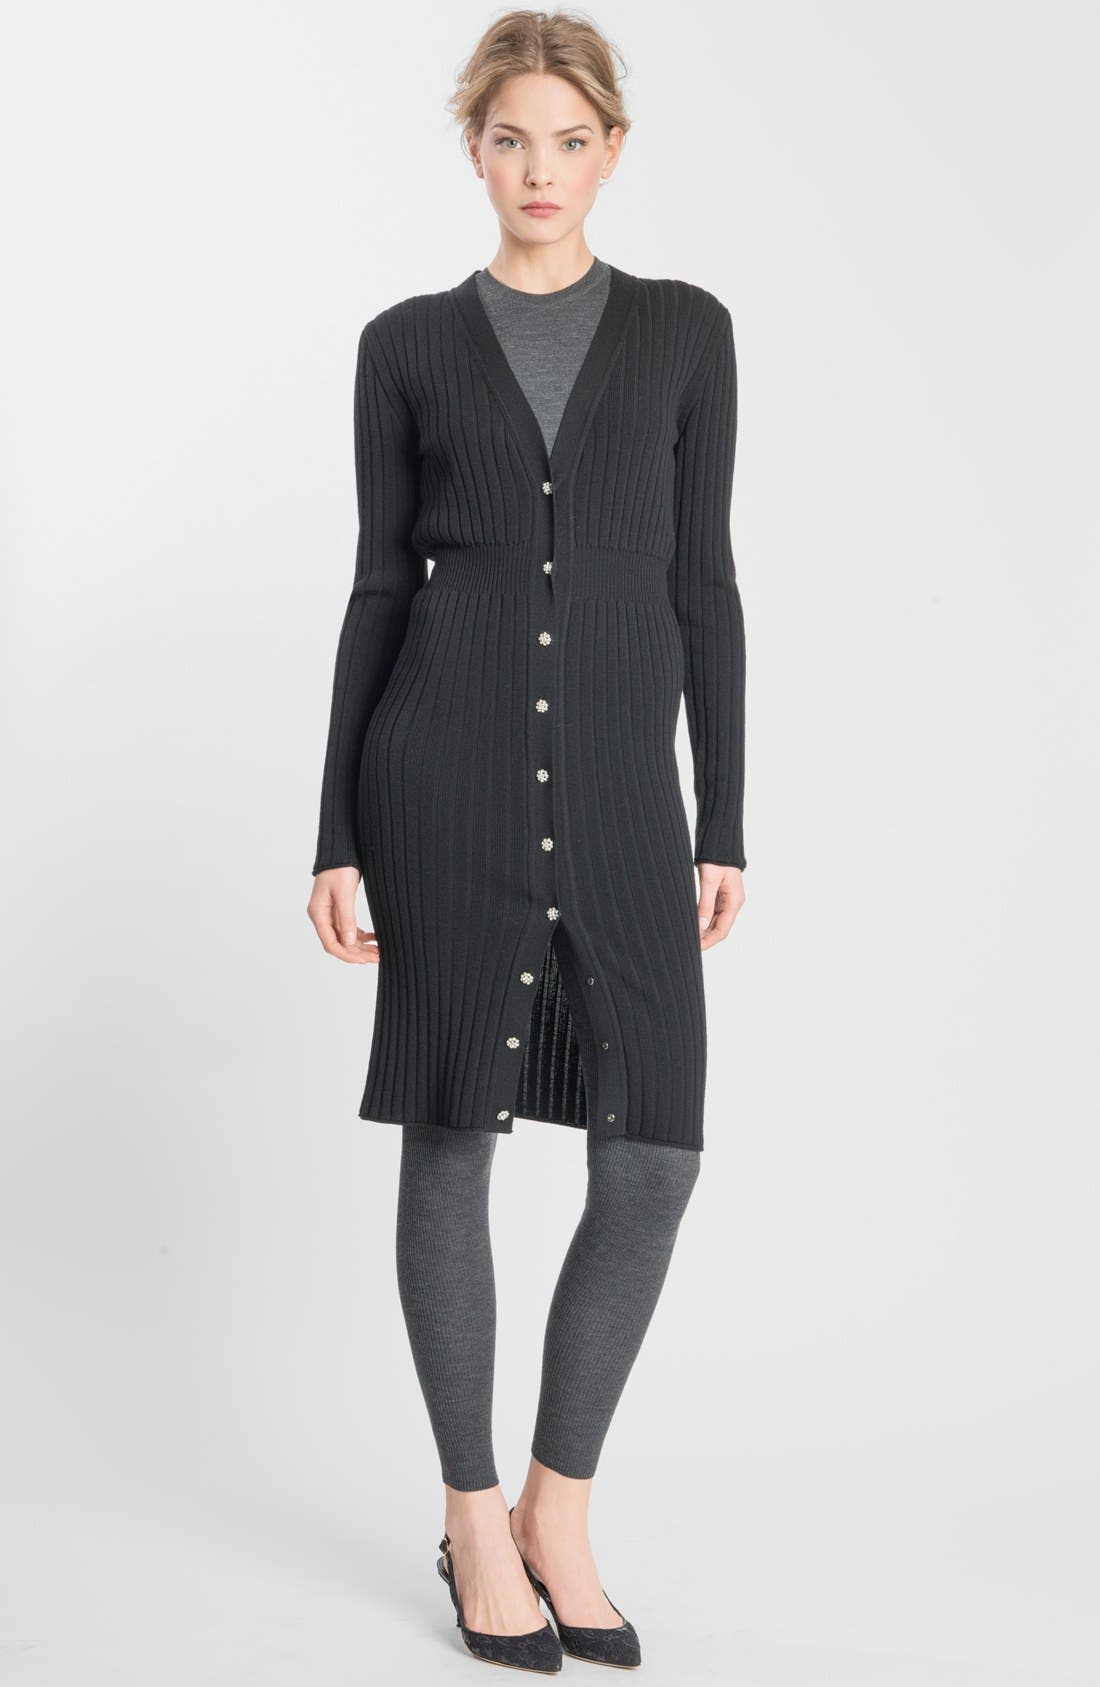 Main Image - Dolce&Gabbana Crystal Button Ribbed Wool Sweater Dress